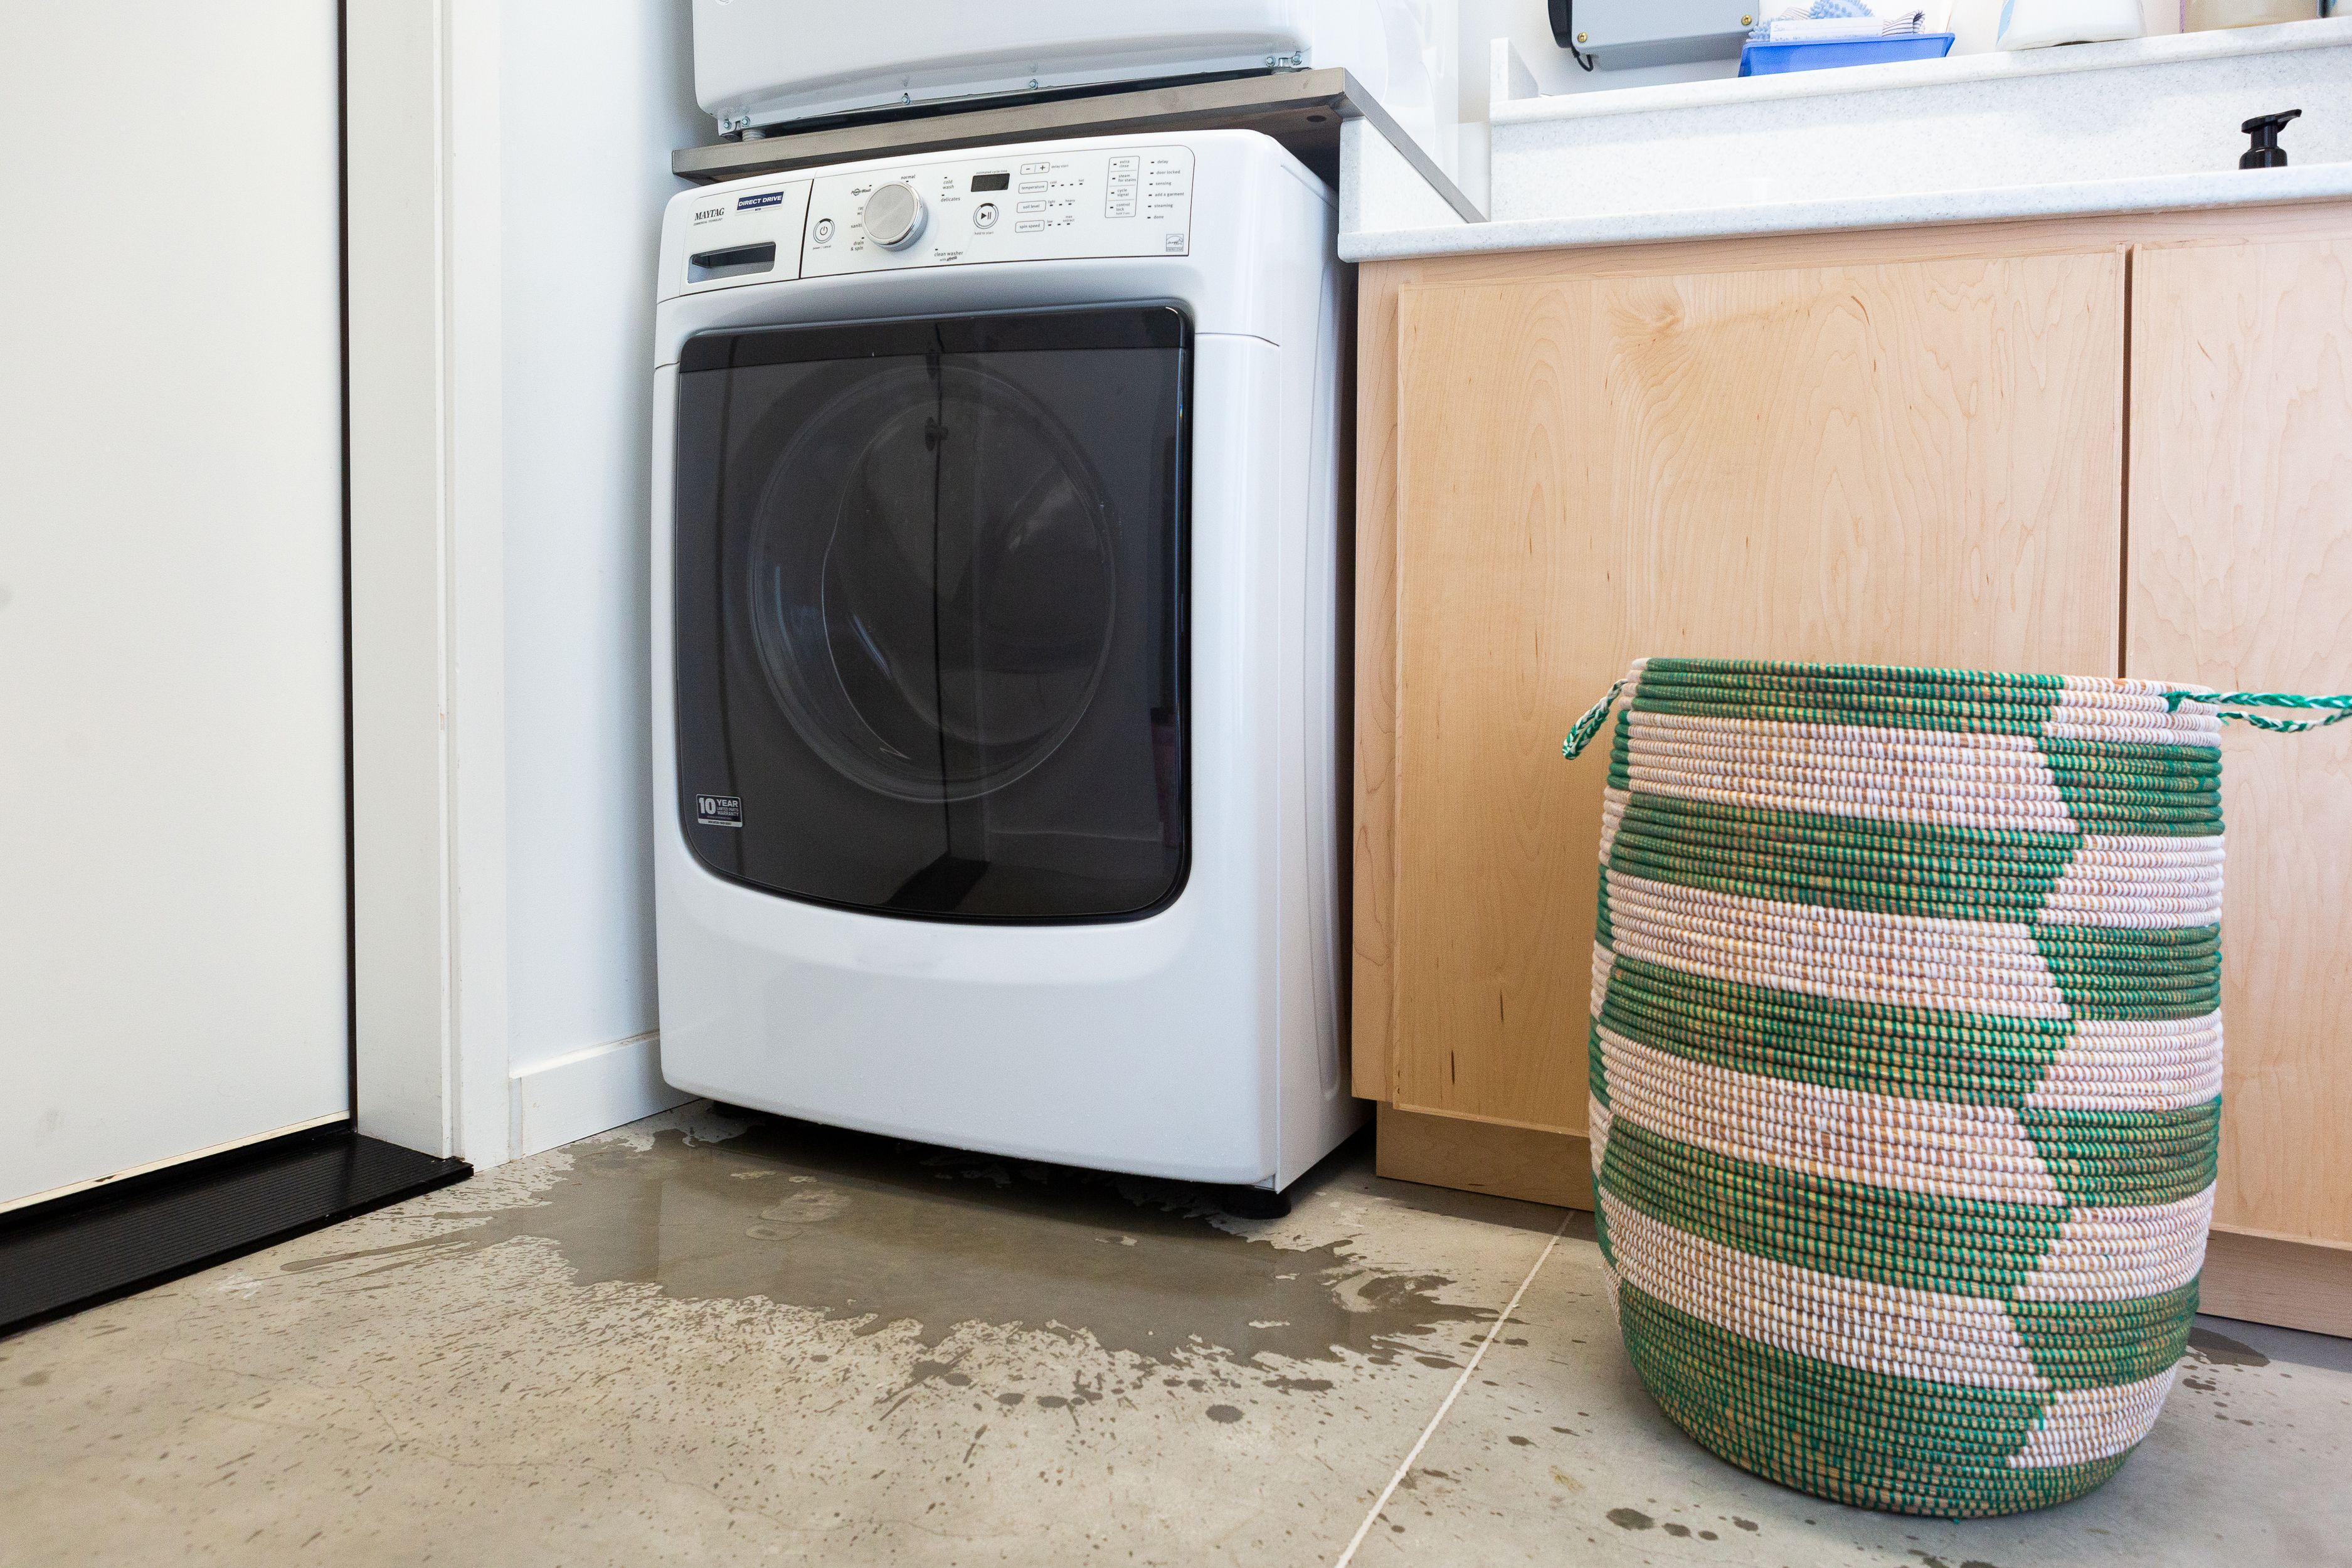 How To Diagnose Washing Machine Leaking